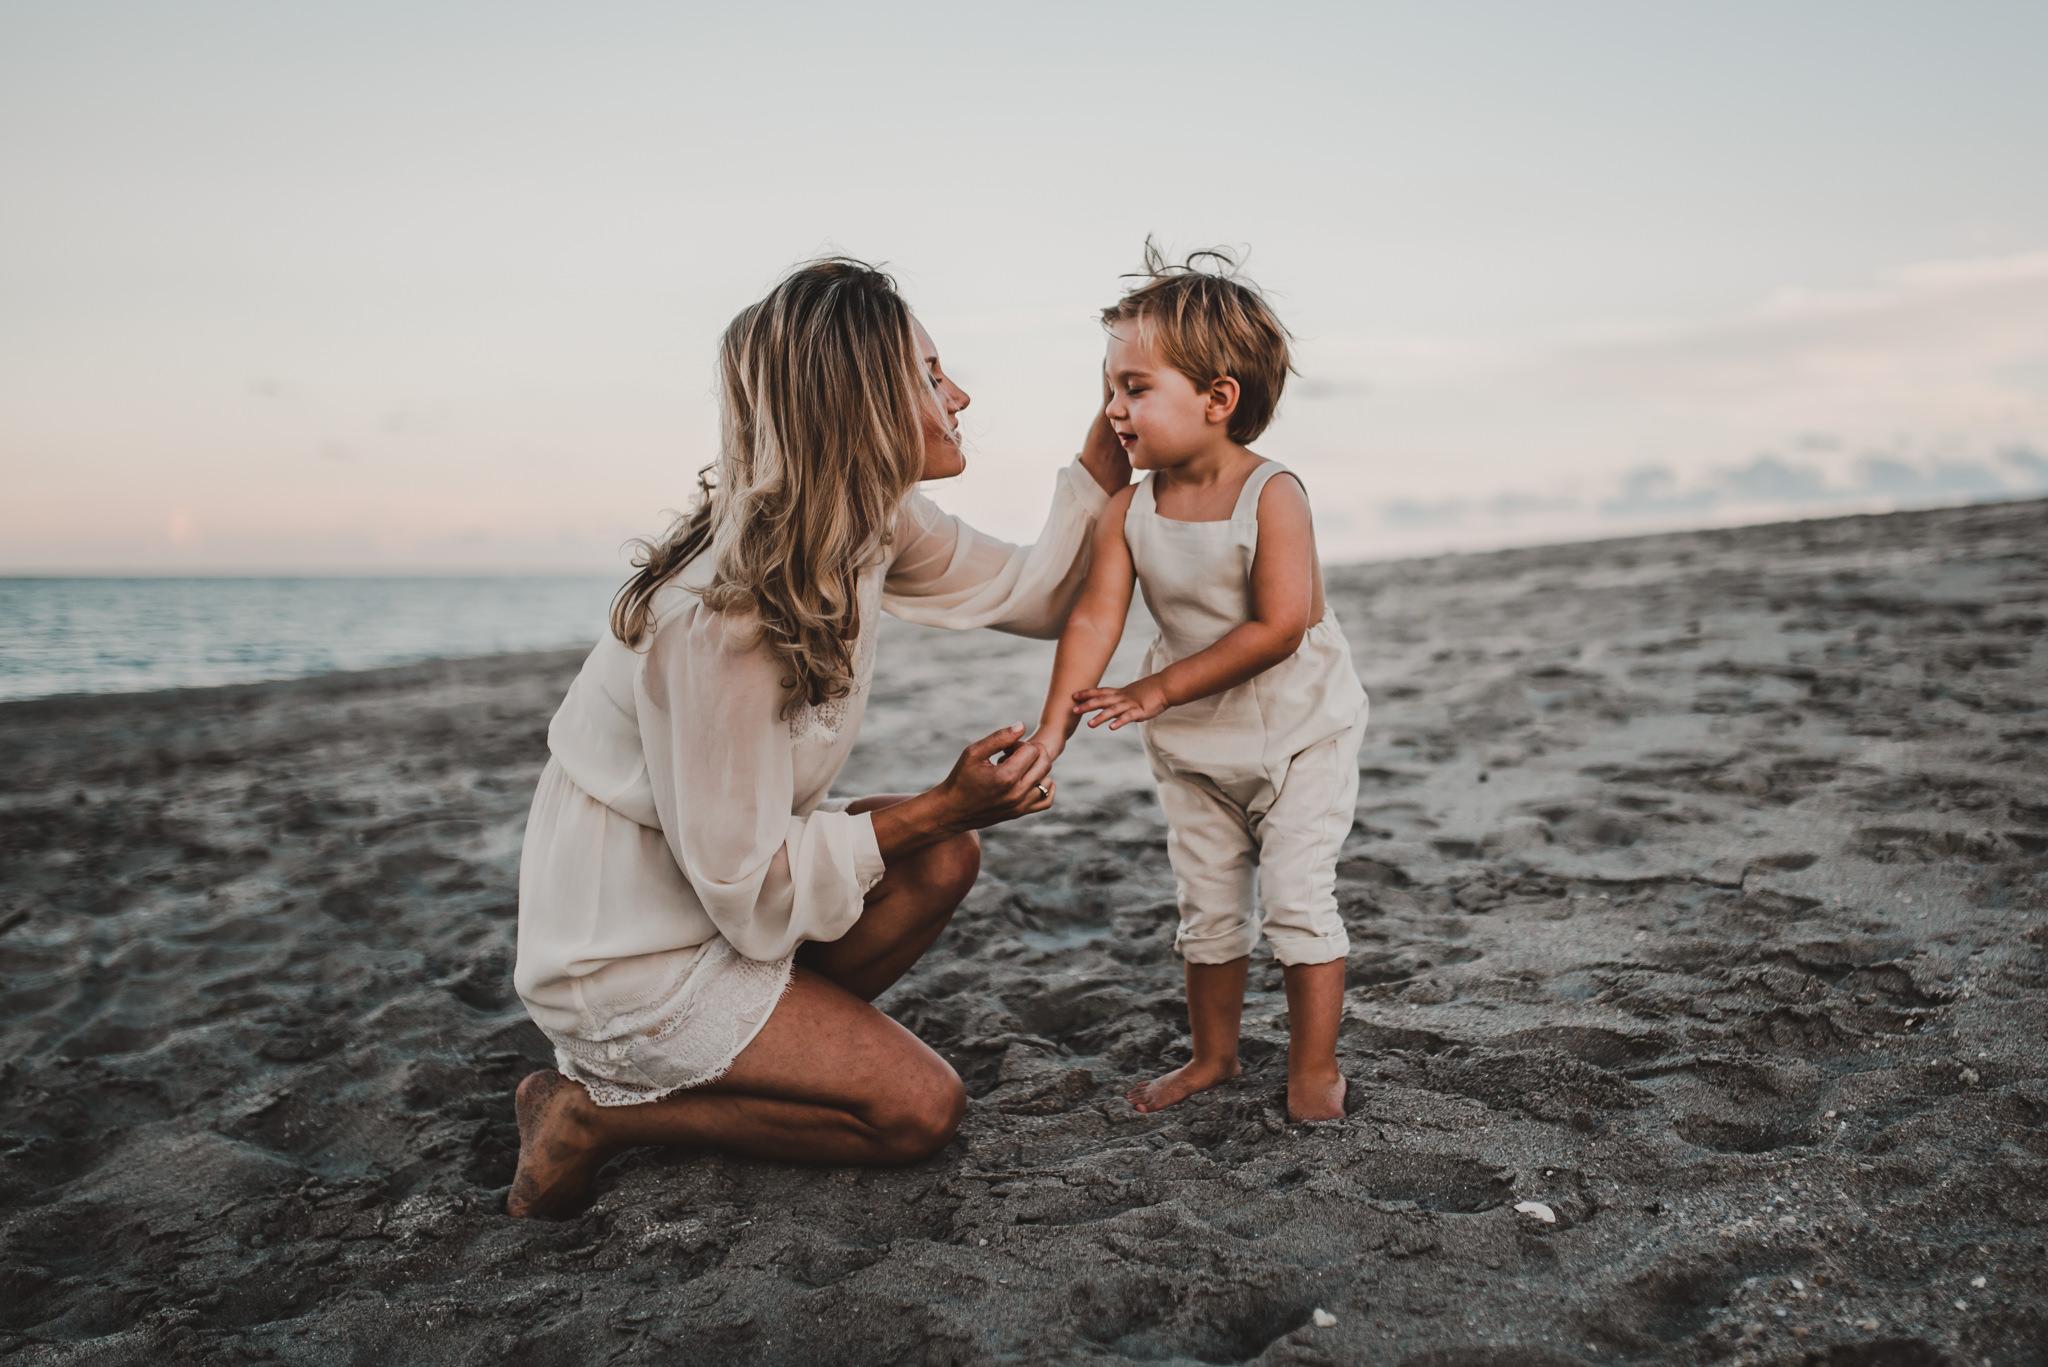 twyla jones photography - treasure coast florida - mother son at the beach--4.jpg